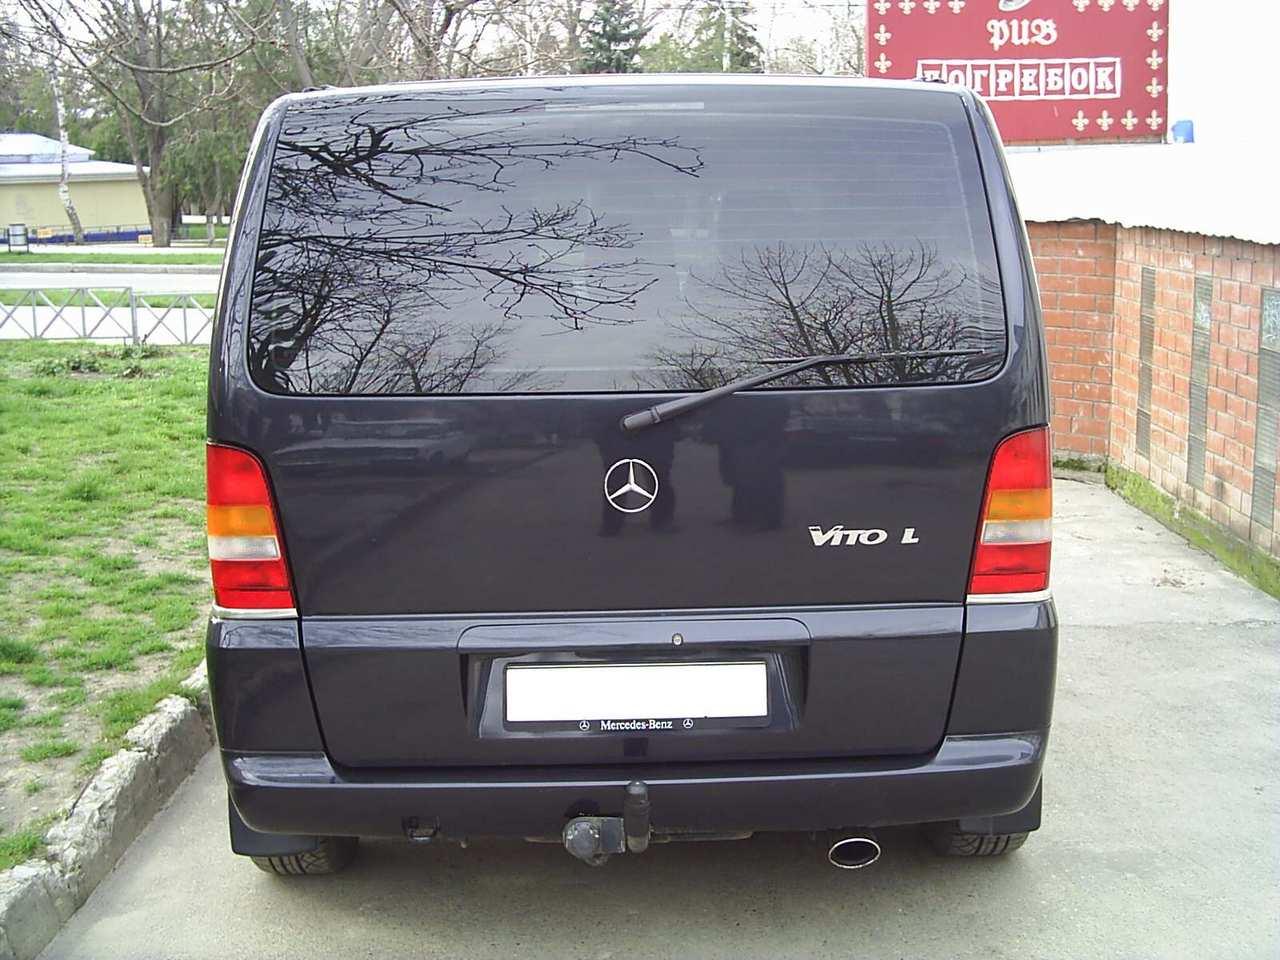 2002 Mercedes Benz VITO specs, Engine size 2.2, Fuel type ...